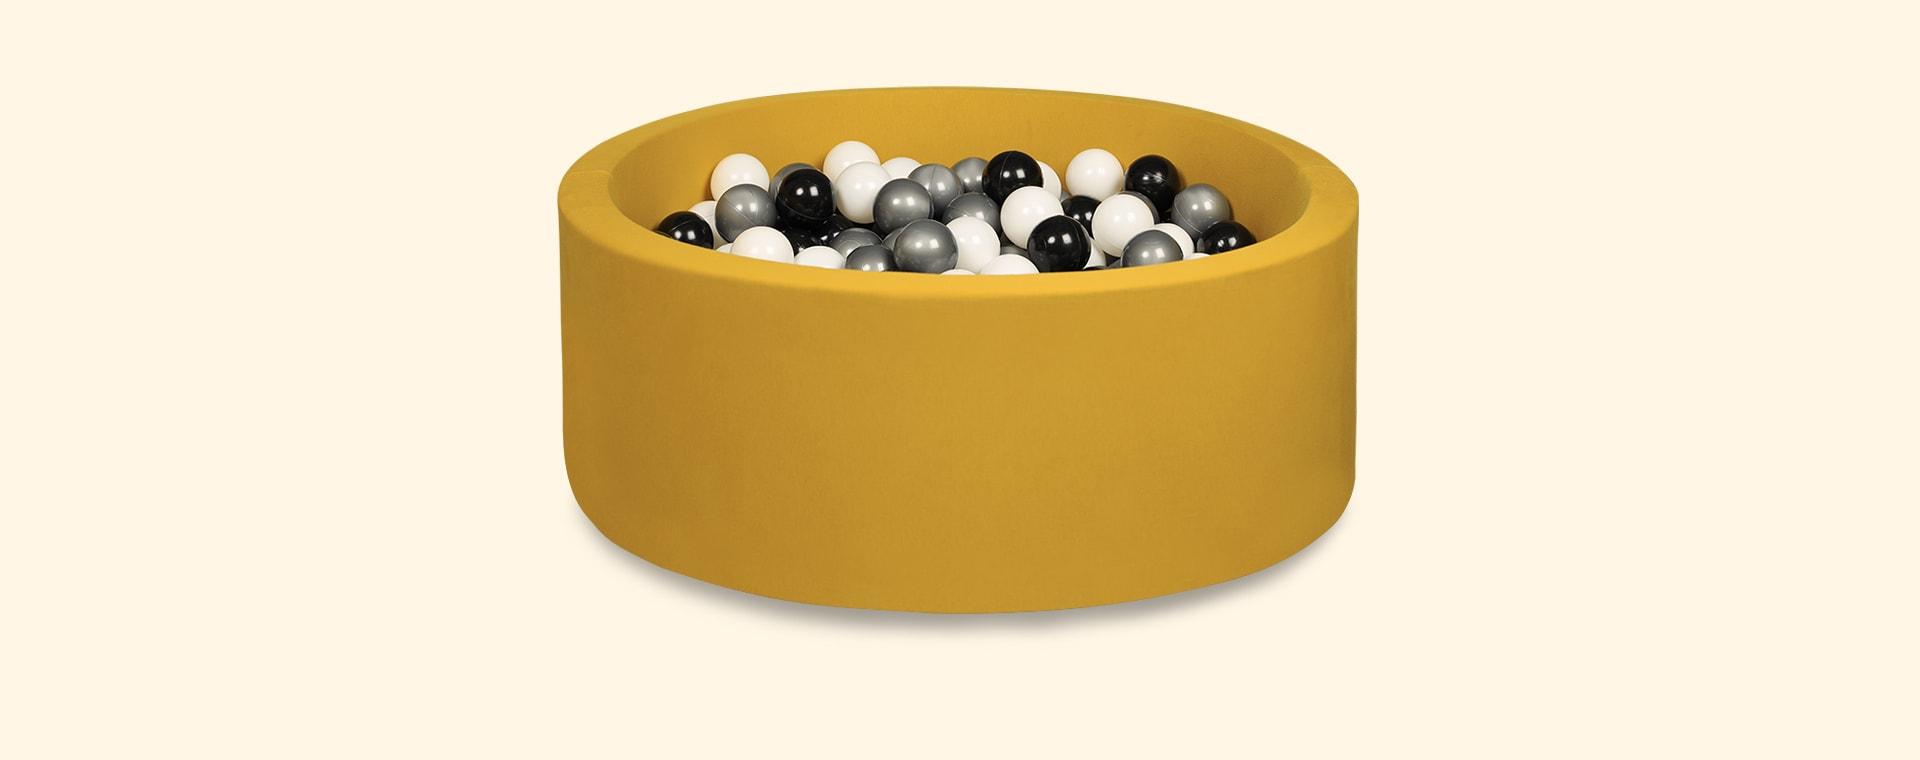 Black/Silver/White Balls Larisa and Pumpkin Organic Cotton Ball Pit